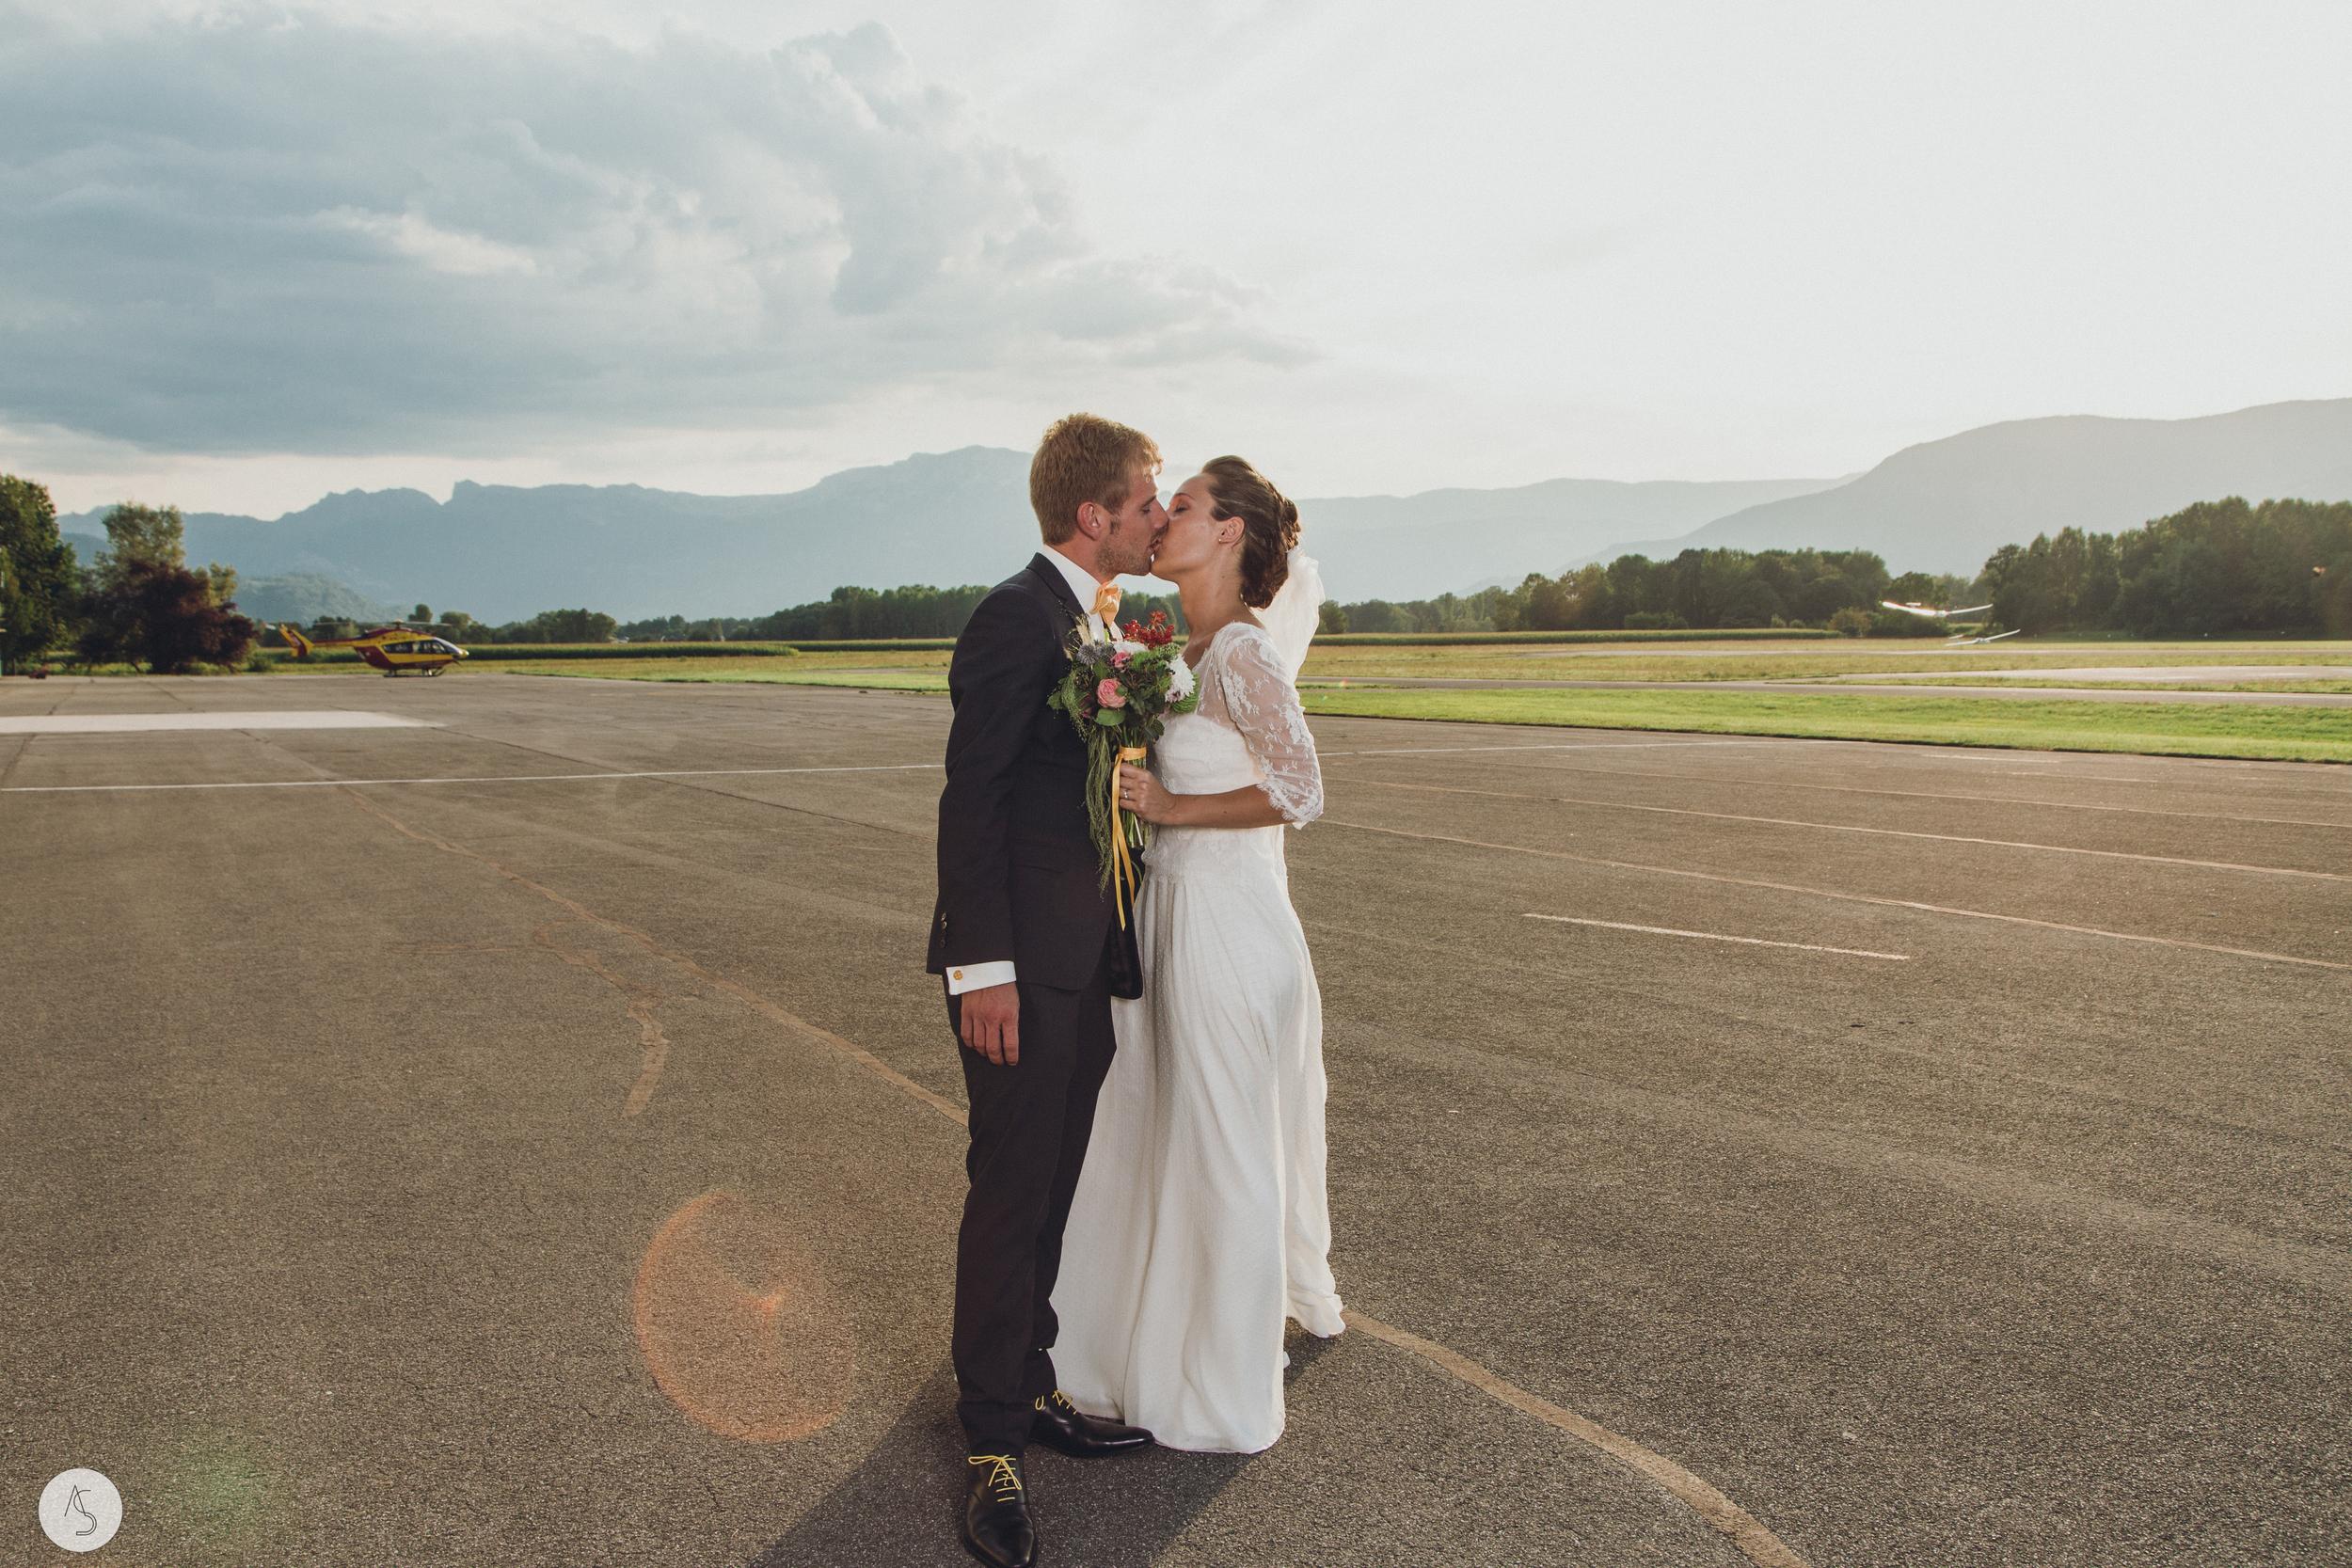 photographe mariage Grenoble-89.jpg